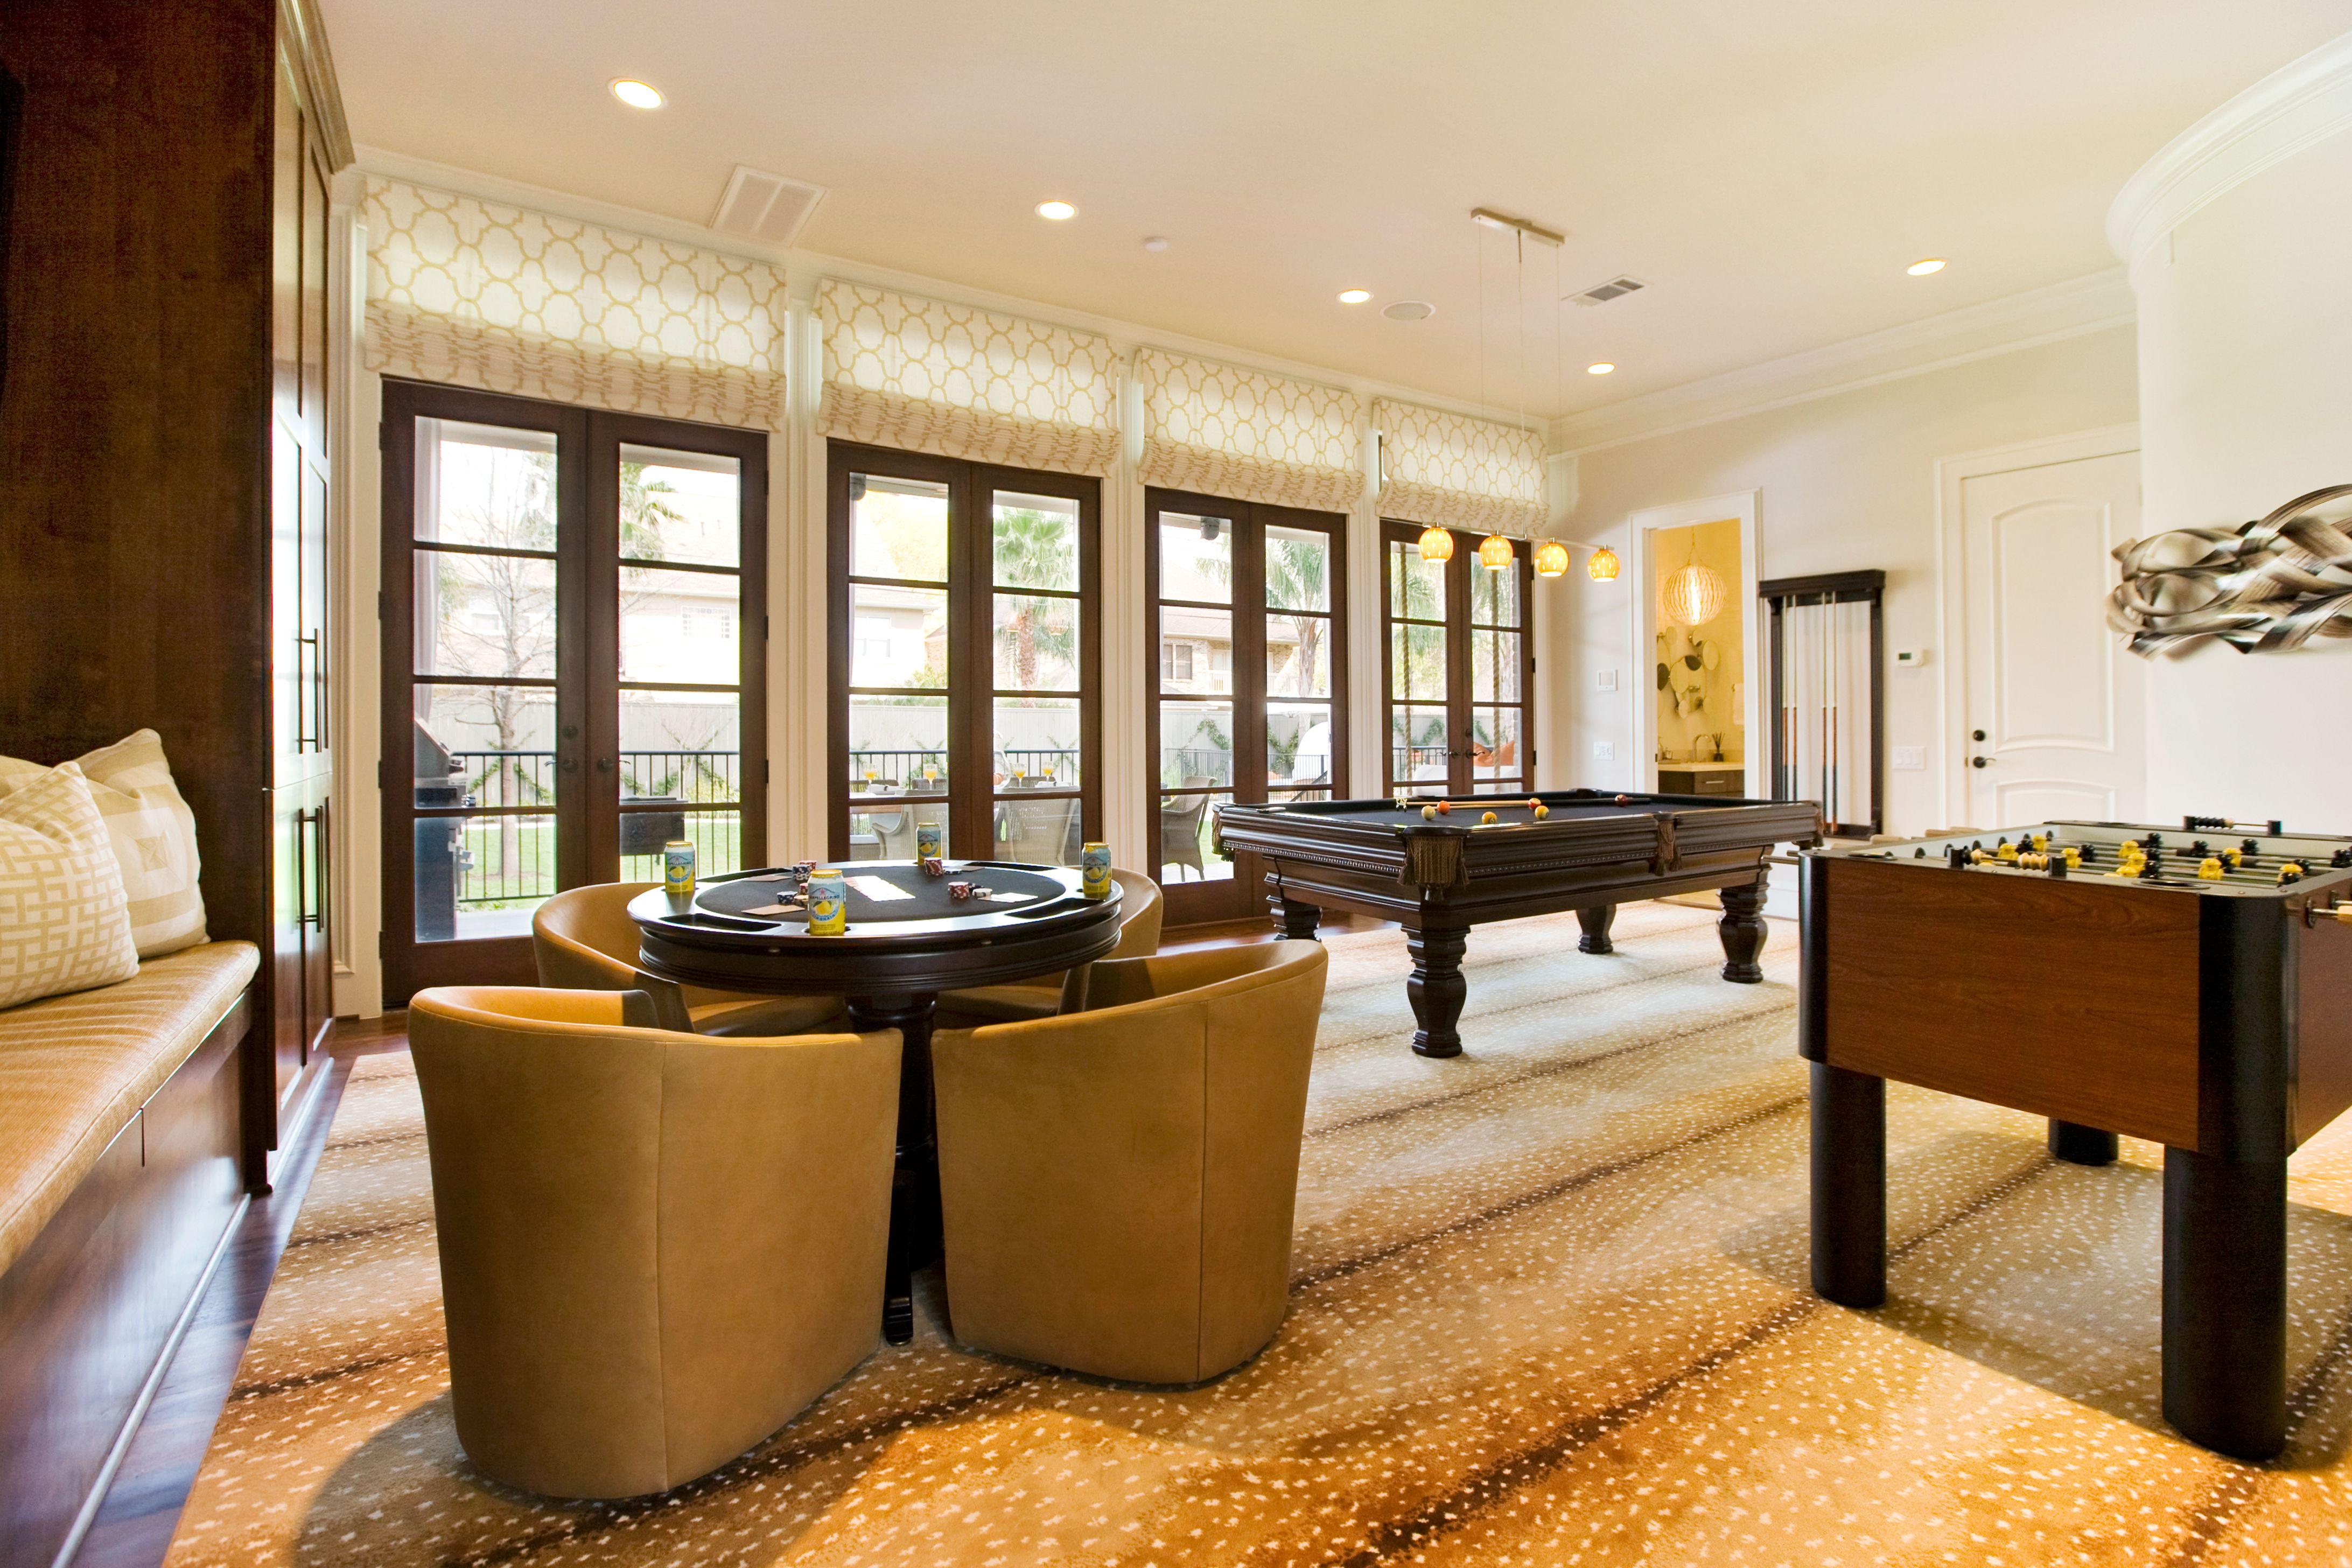 Design Your Own Bedroom Game Laura U Interior Design #residential #interior #design #gameroom